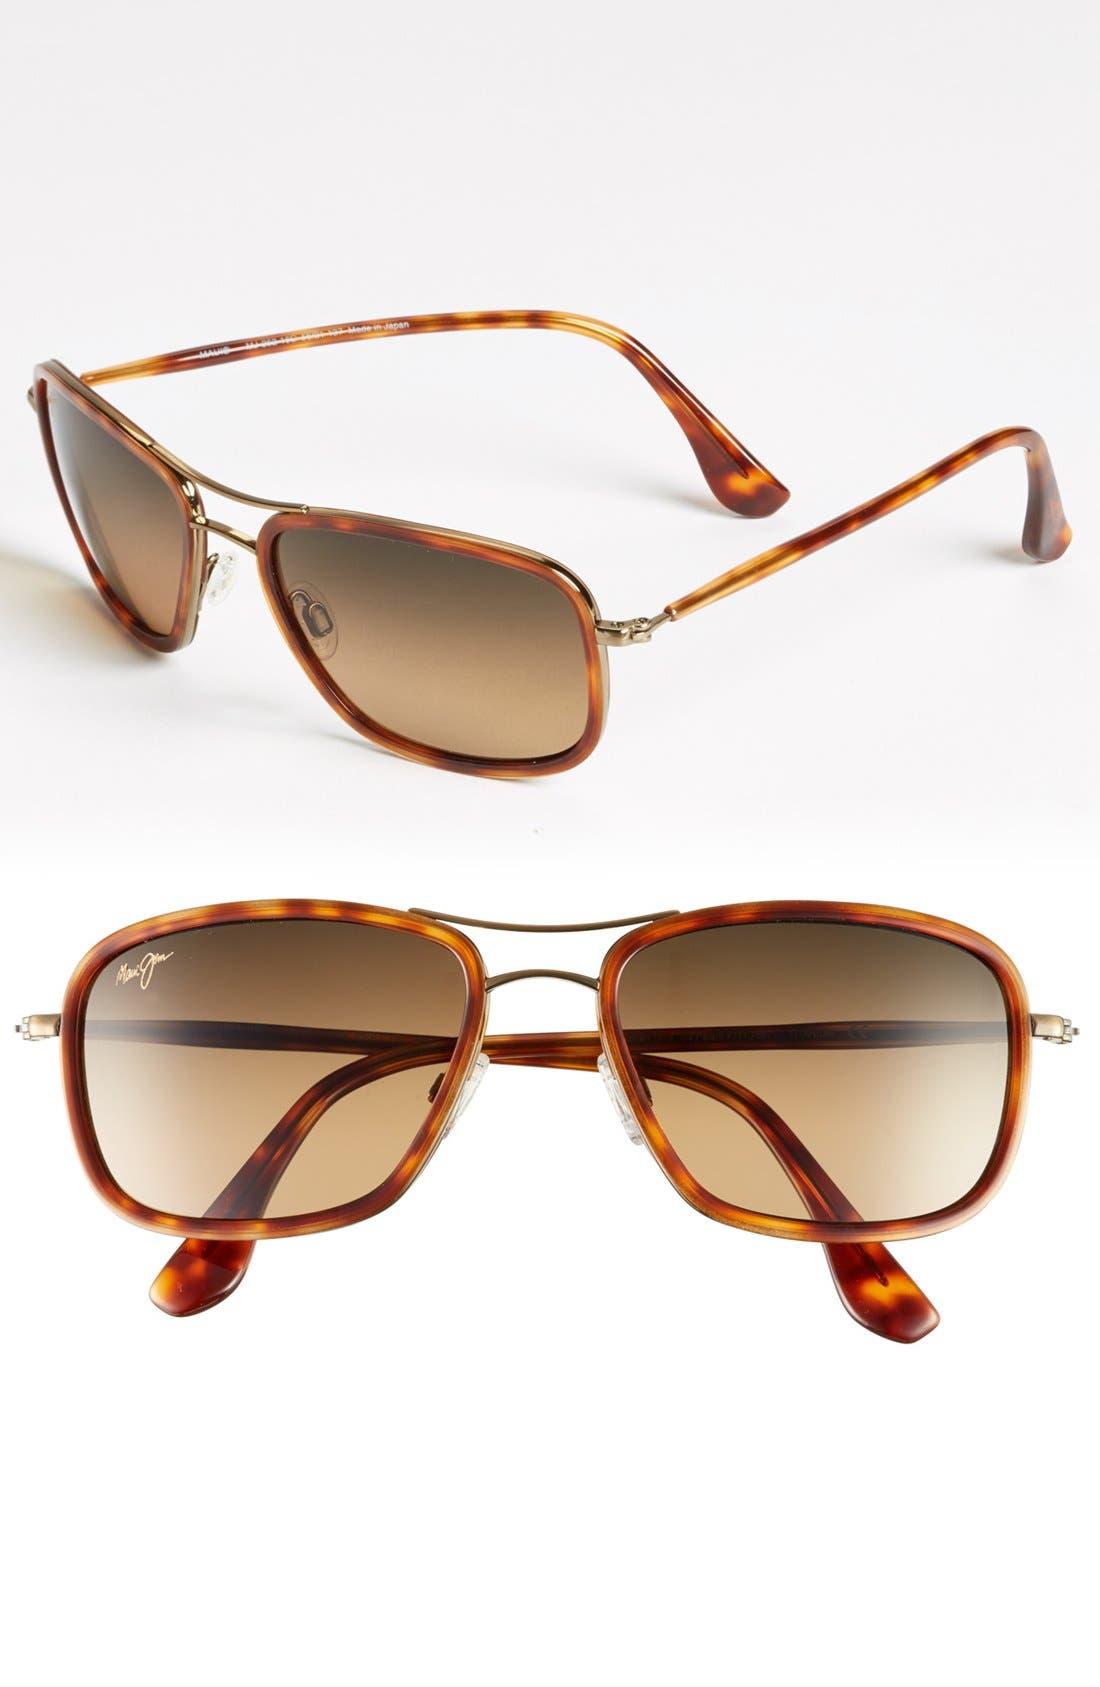 Alternate Image 1 Selected - Maui Jim 'Hawaiian Time' 56mm Polarized Aviator Sunglasses